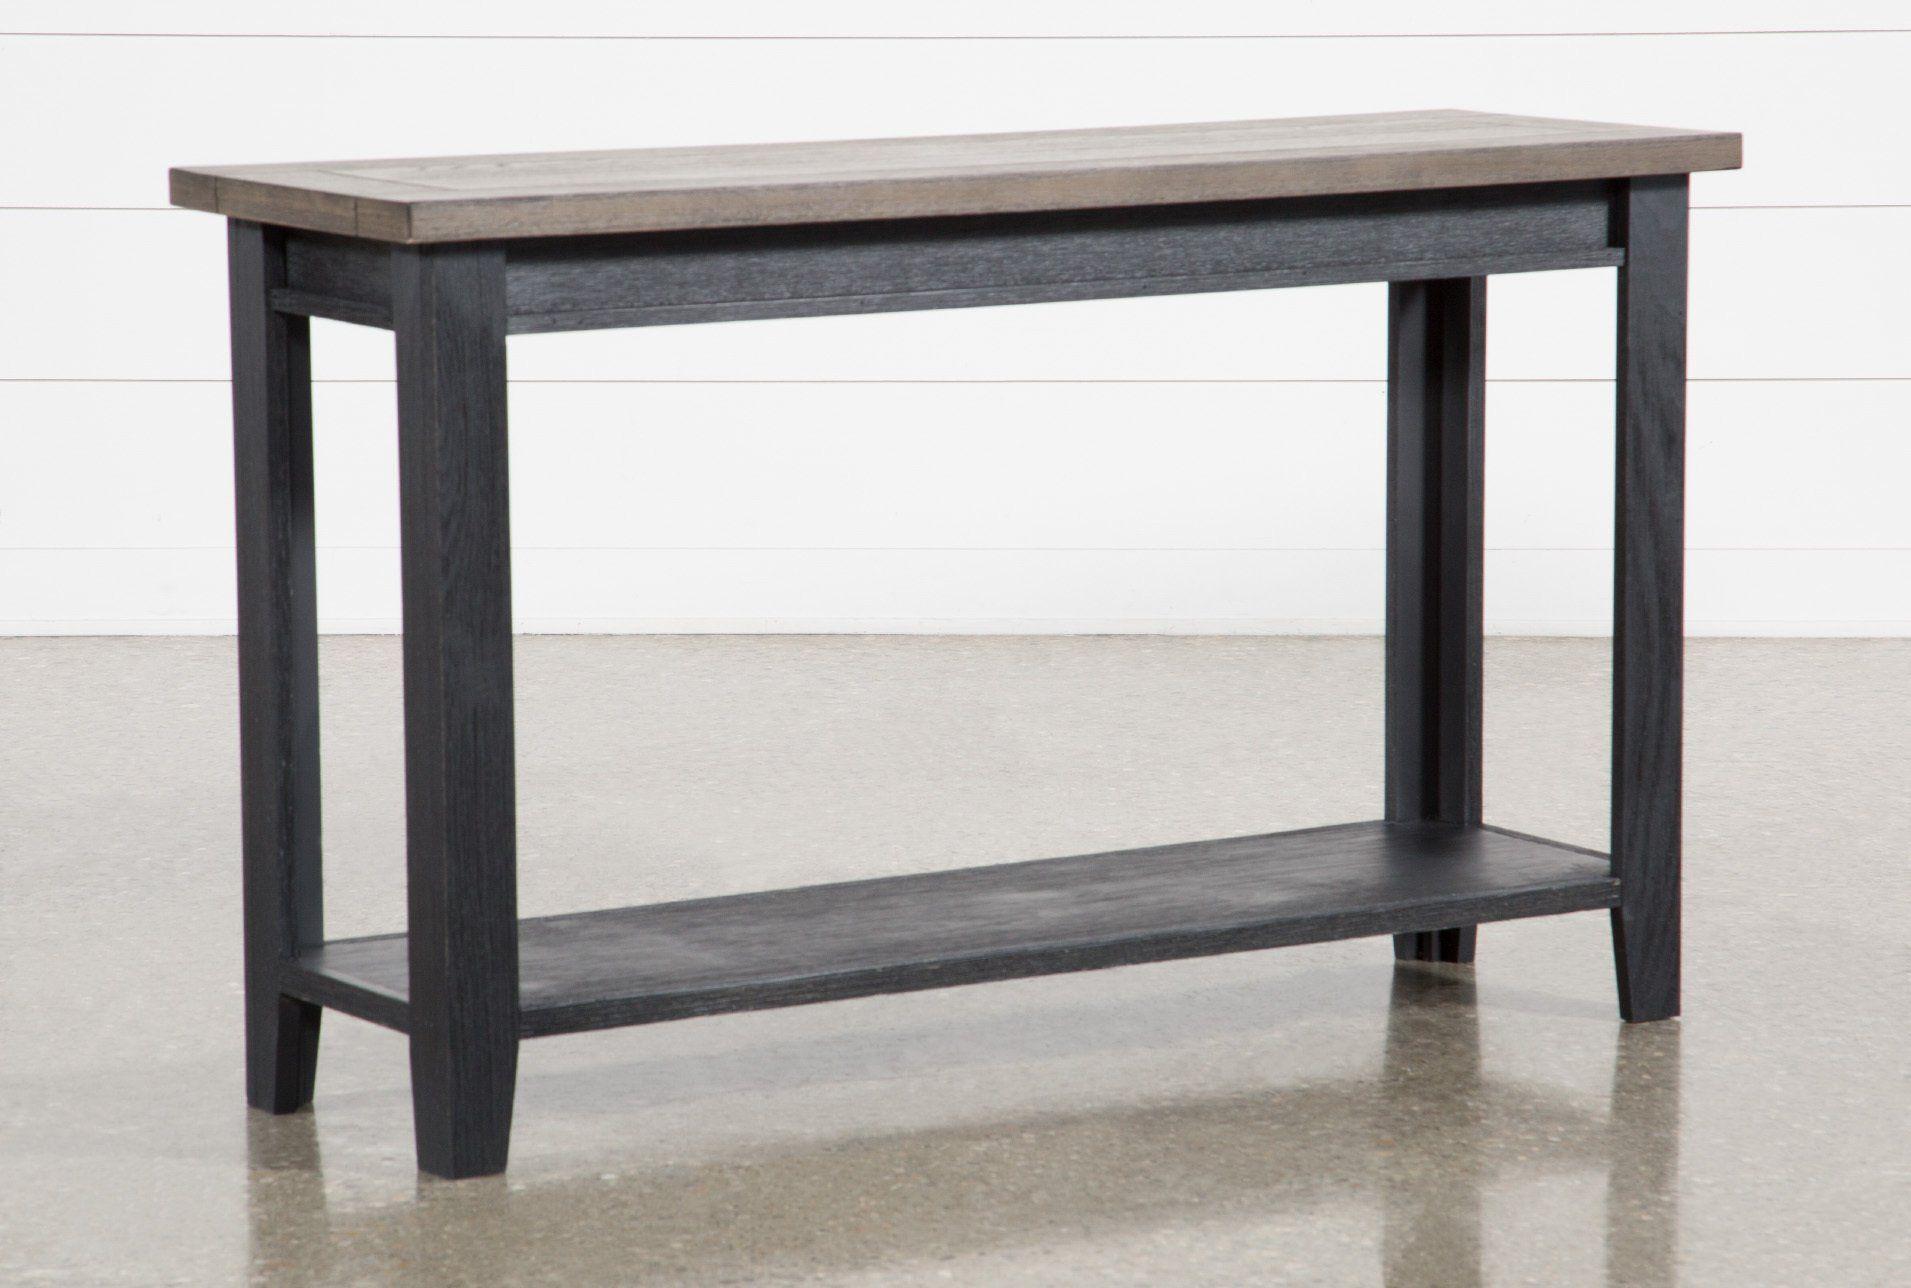 Dixon Black Sofa Table 295 Black Sofa Table Wood Sofa Table